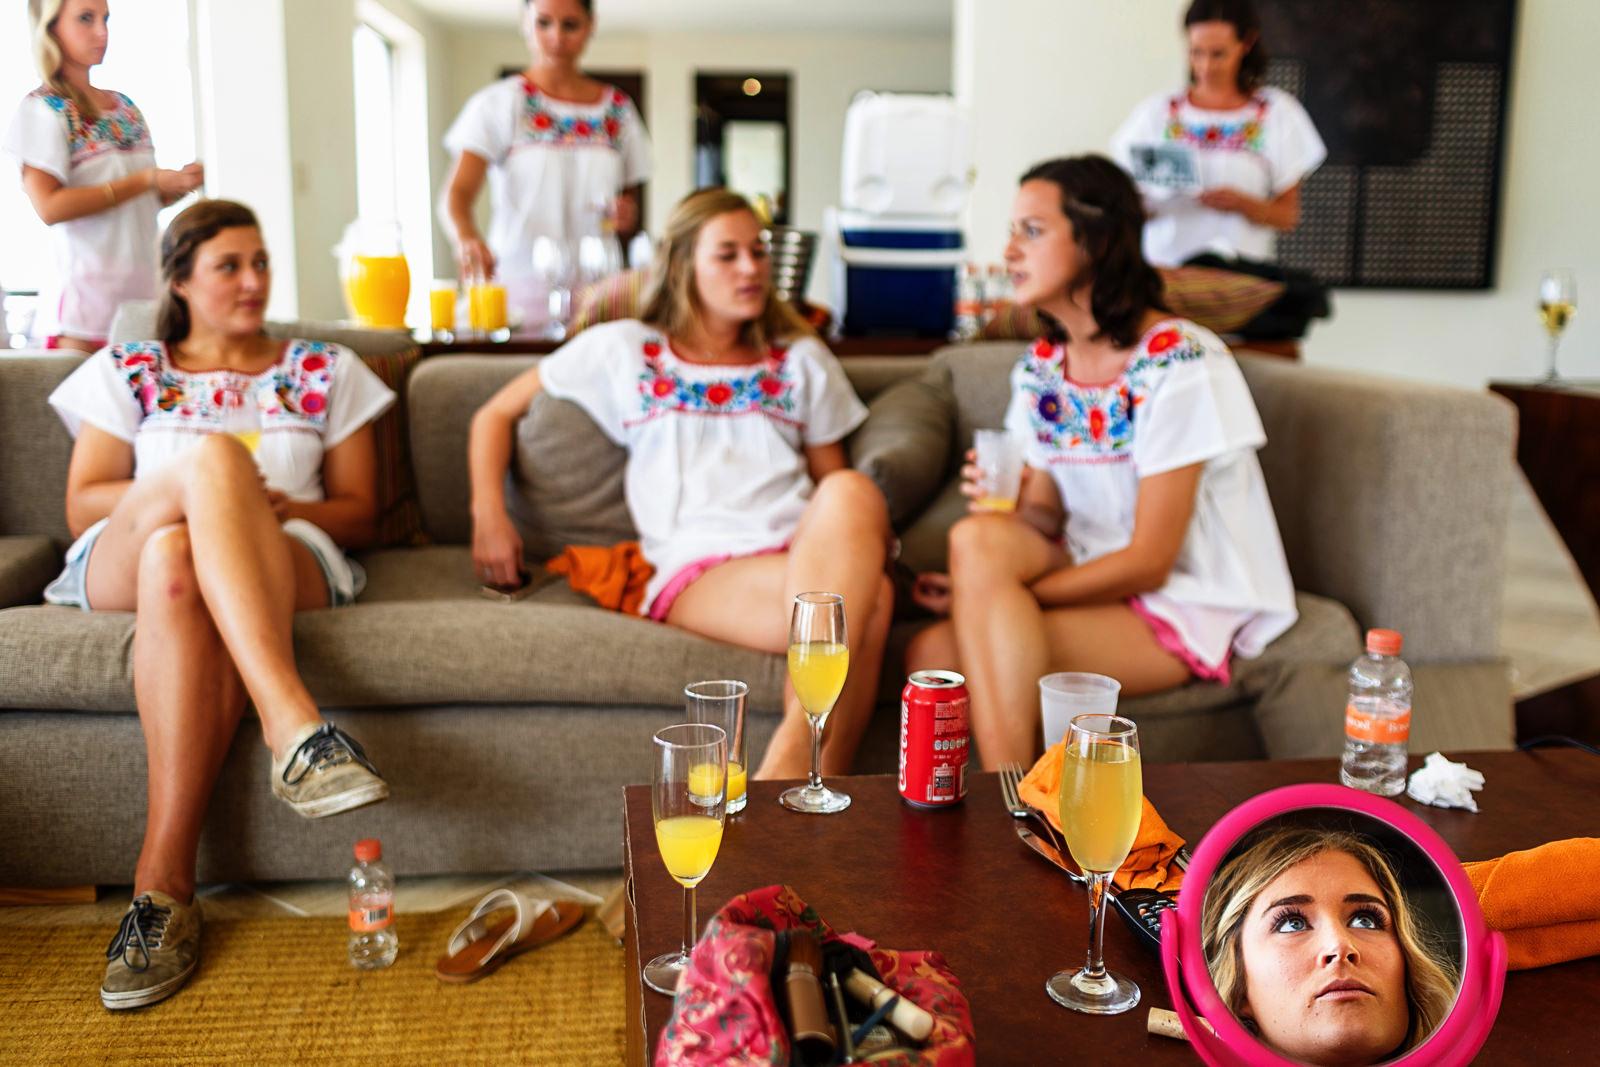 Bridemaids hanging in the suite - Eder Acevedo cancun los cabos vallarta wedding photographer